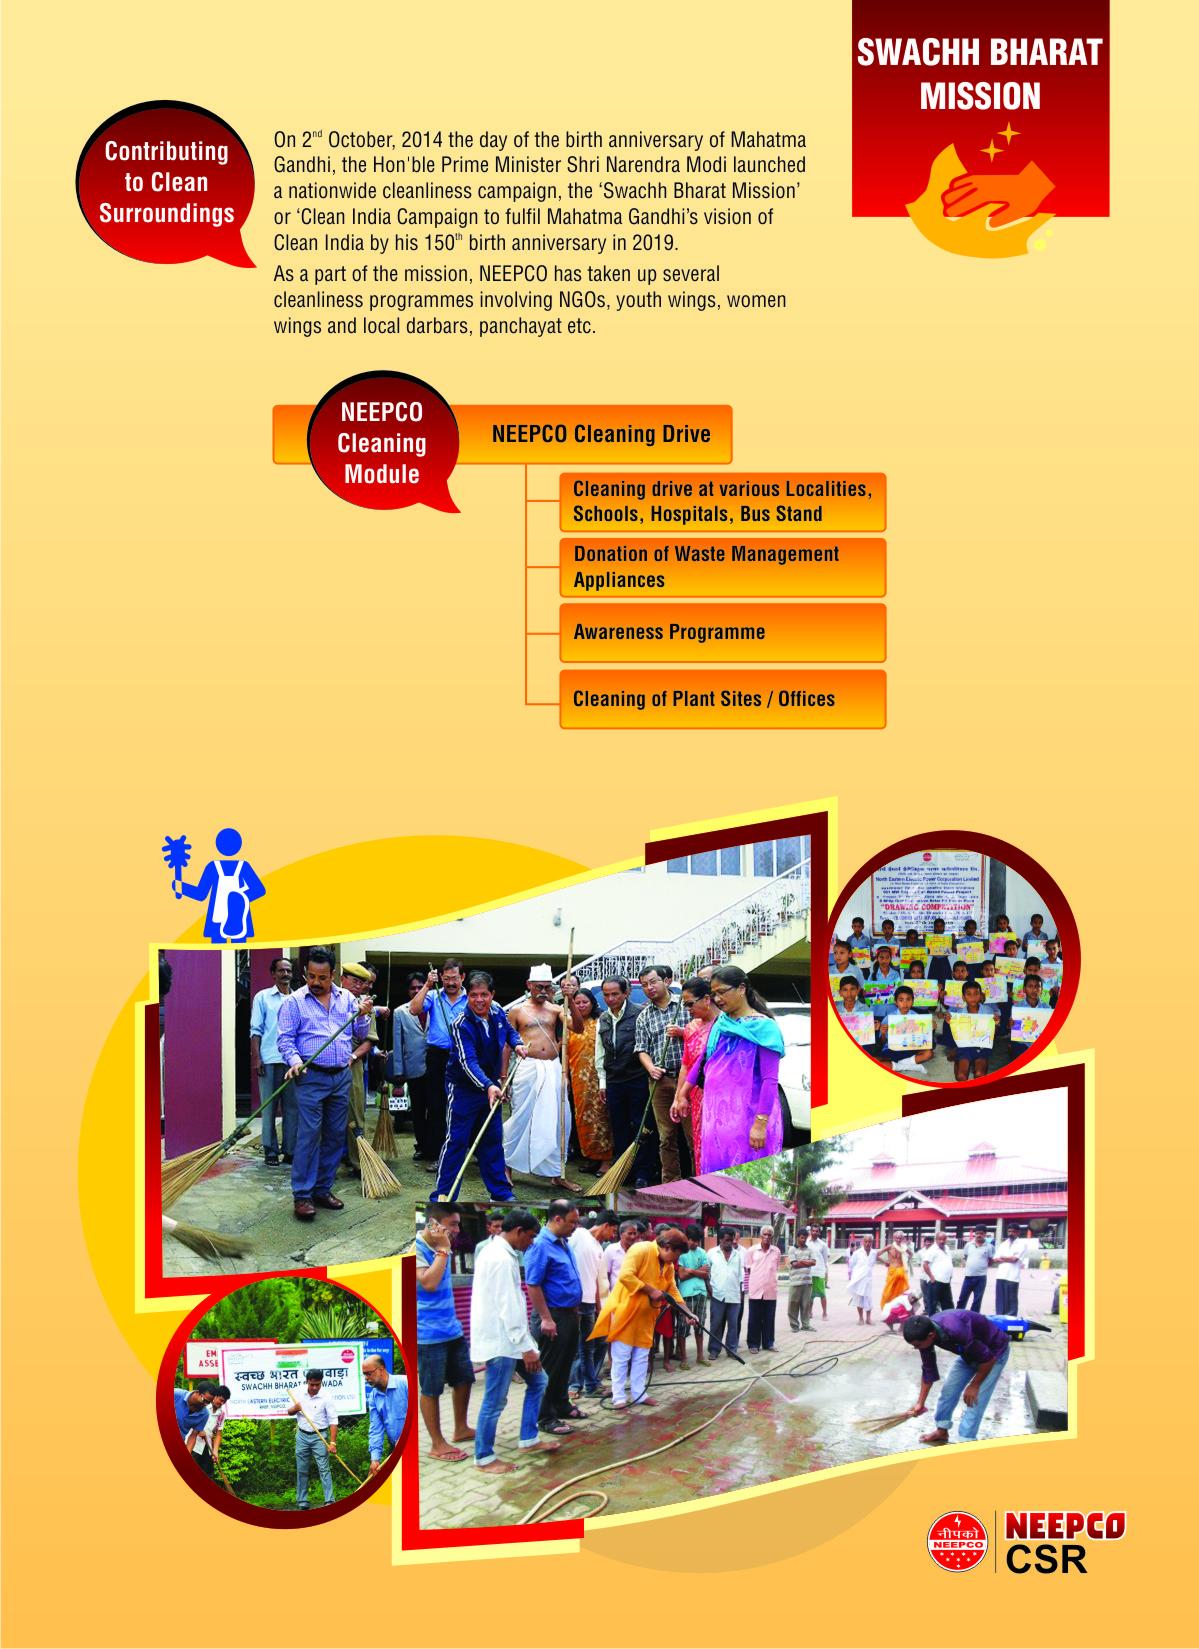 Swachh Bharath Mission